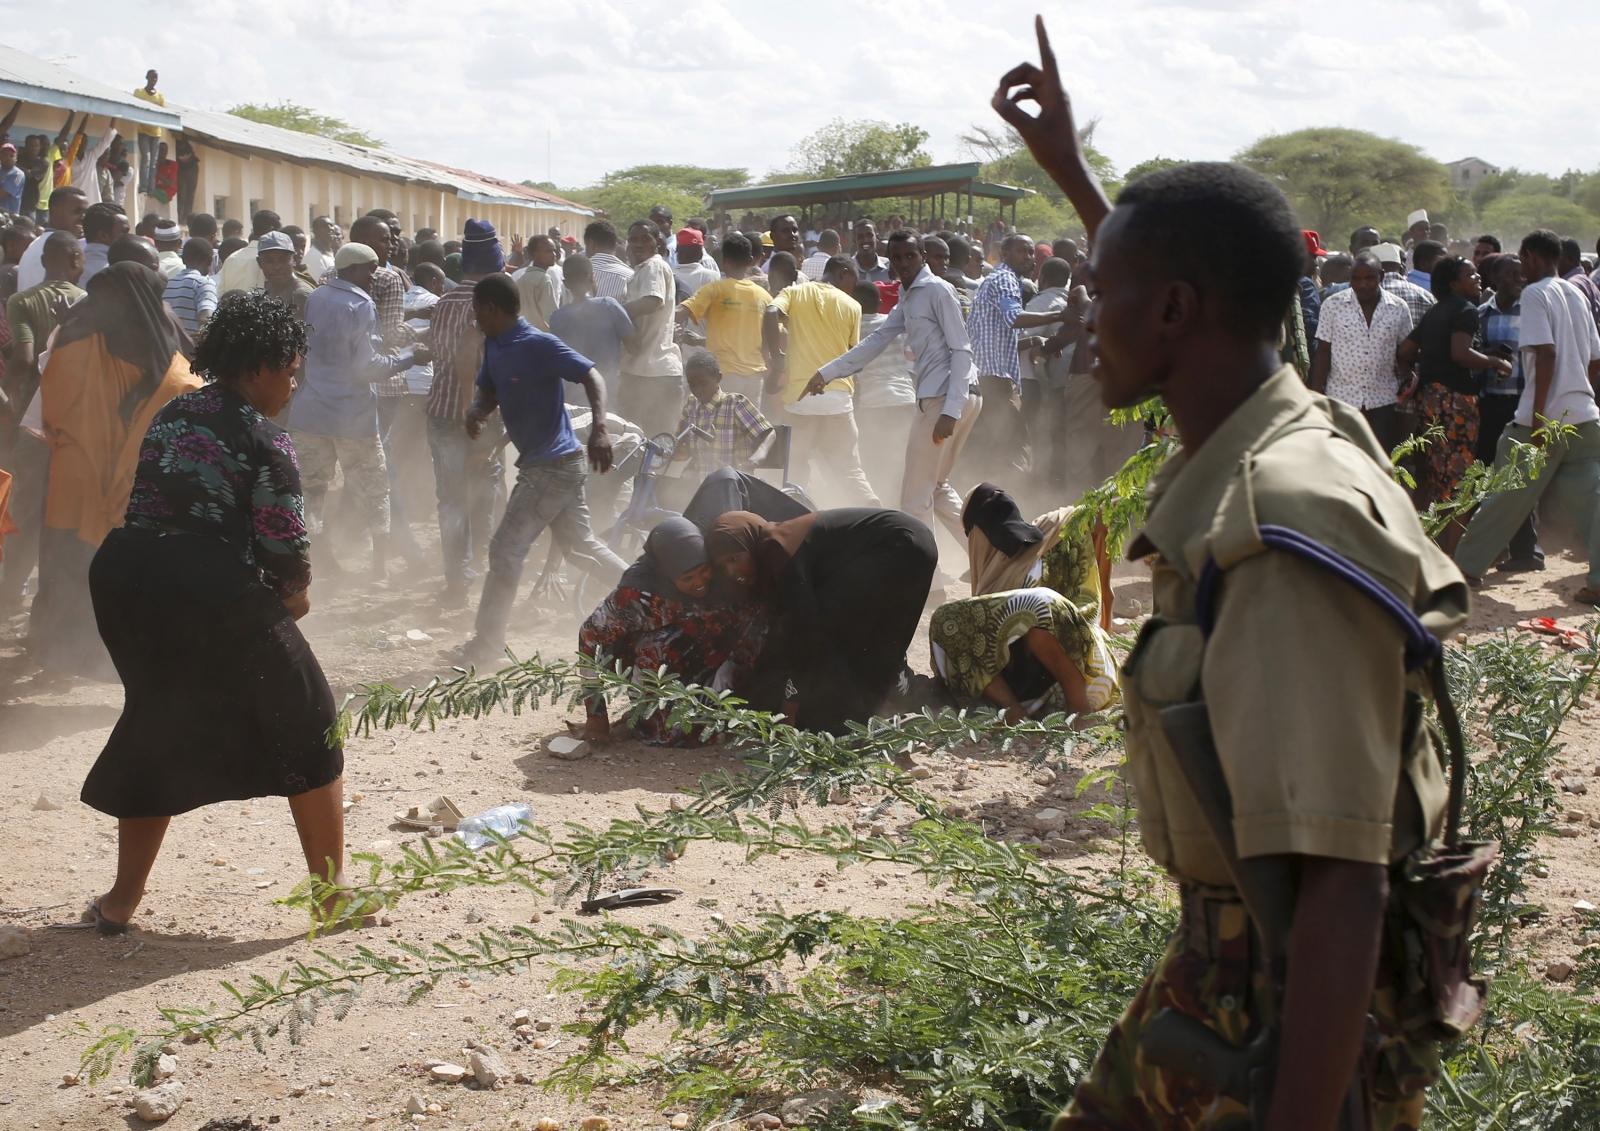 Kenya Garissa attack by al-Shabaab